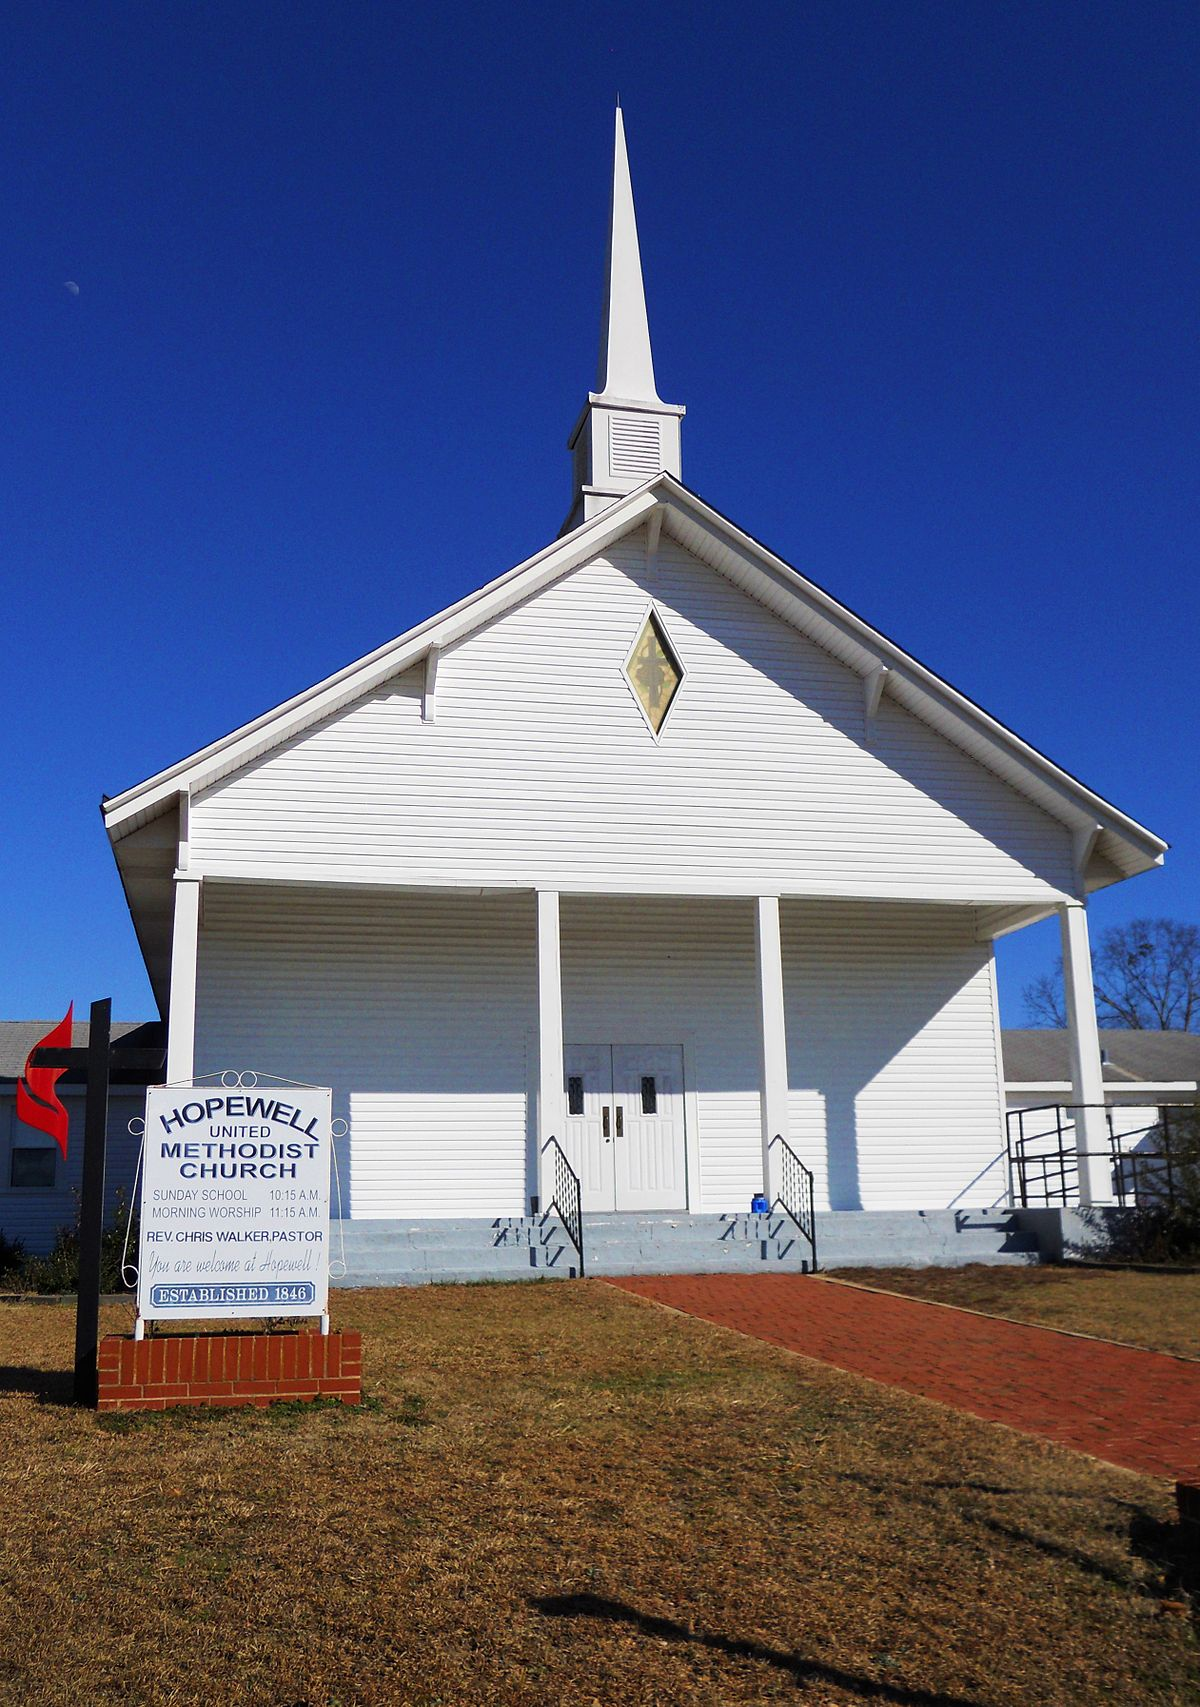 Alabama lee county salem - Alabama Lee County Salem 48